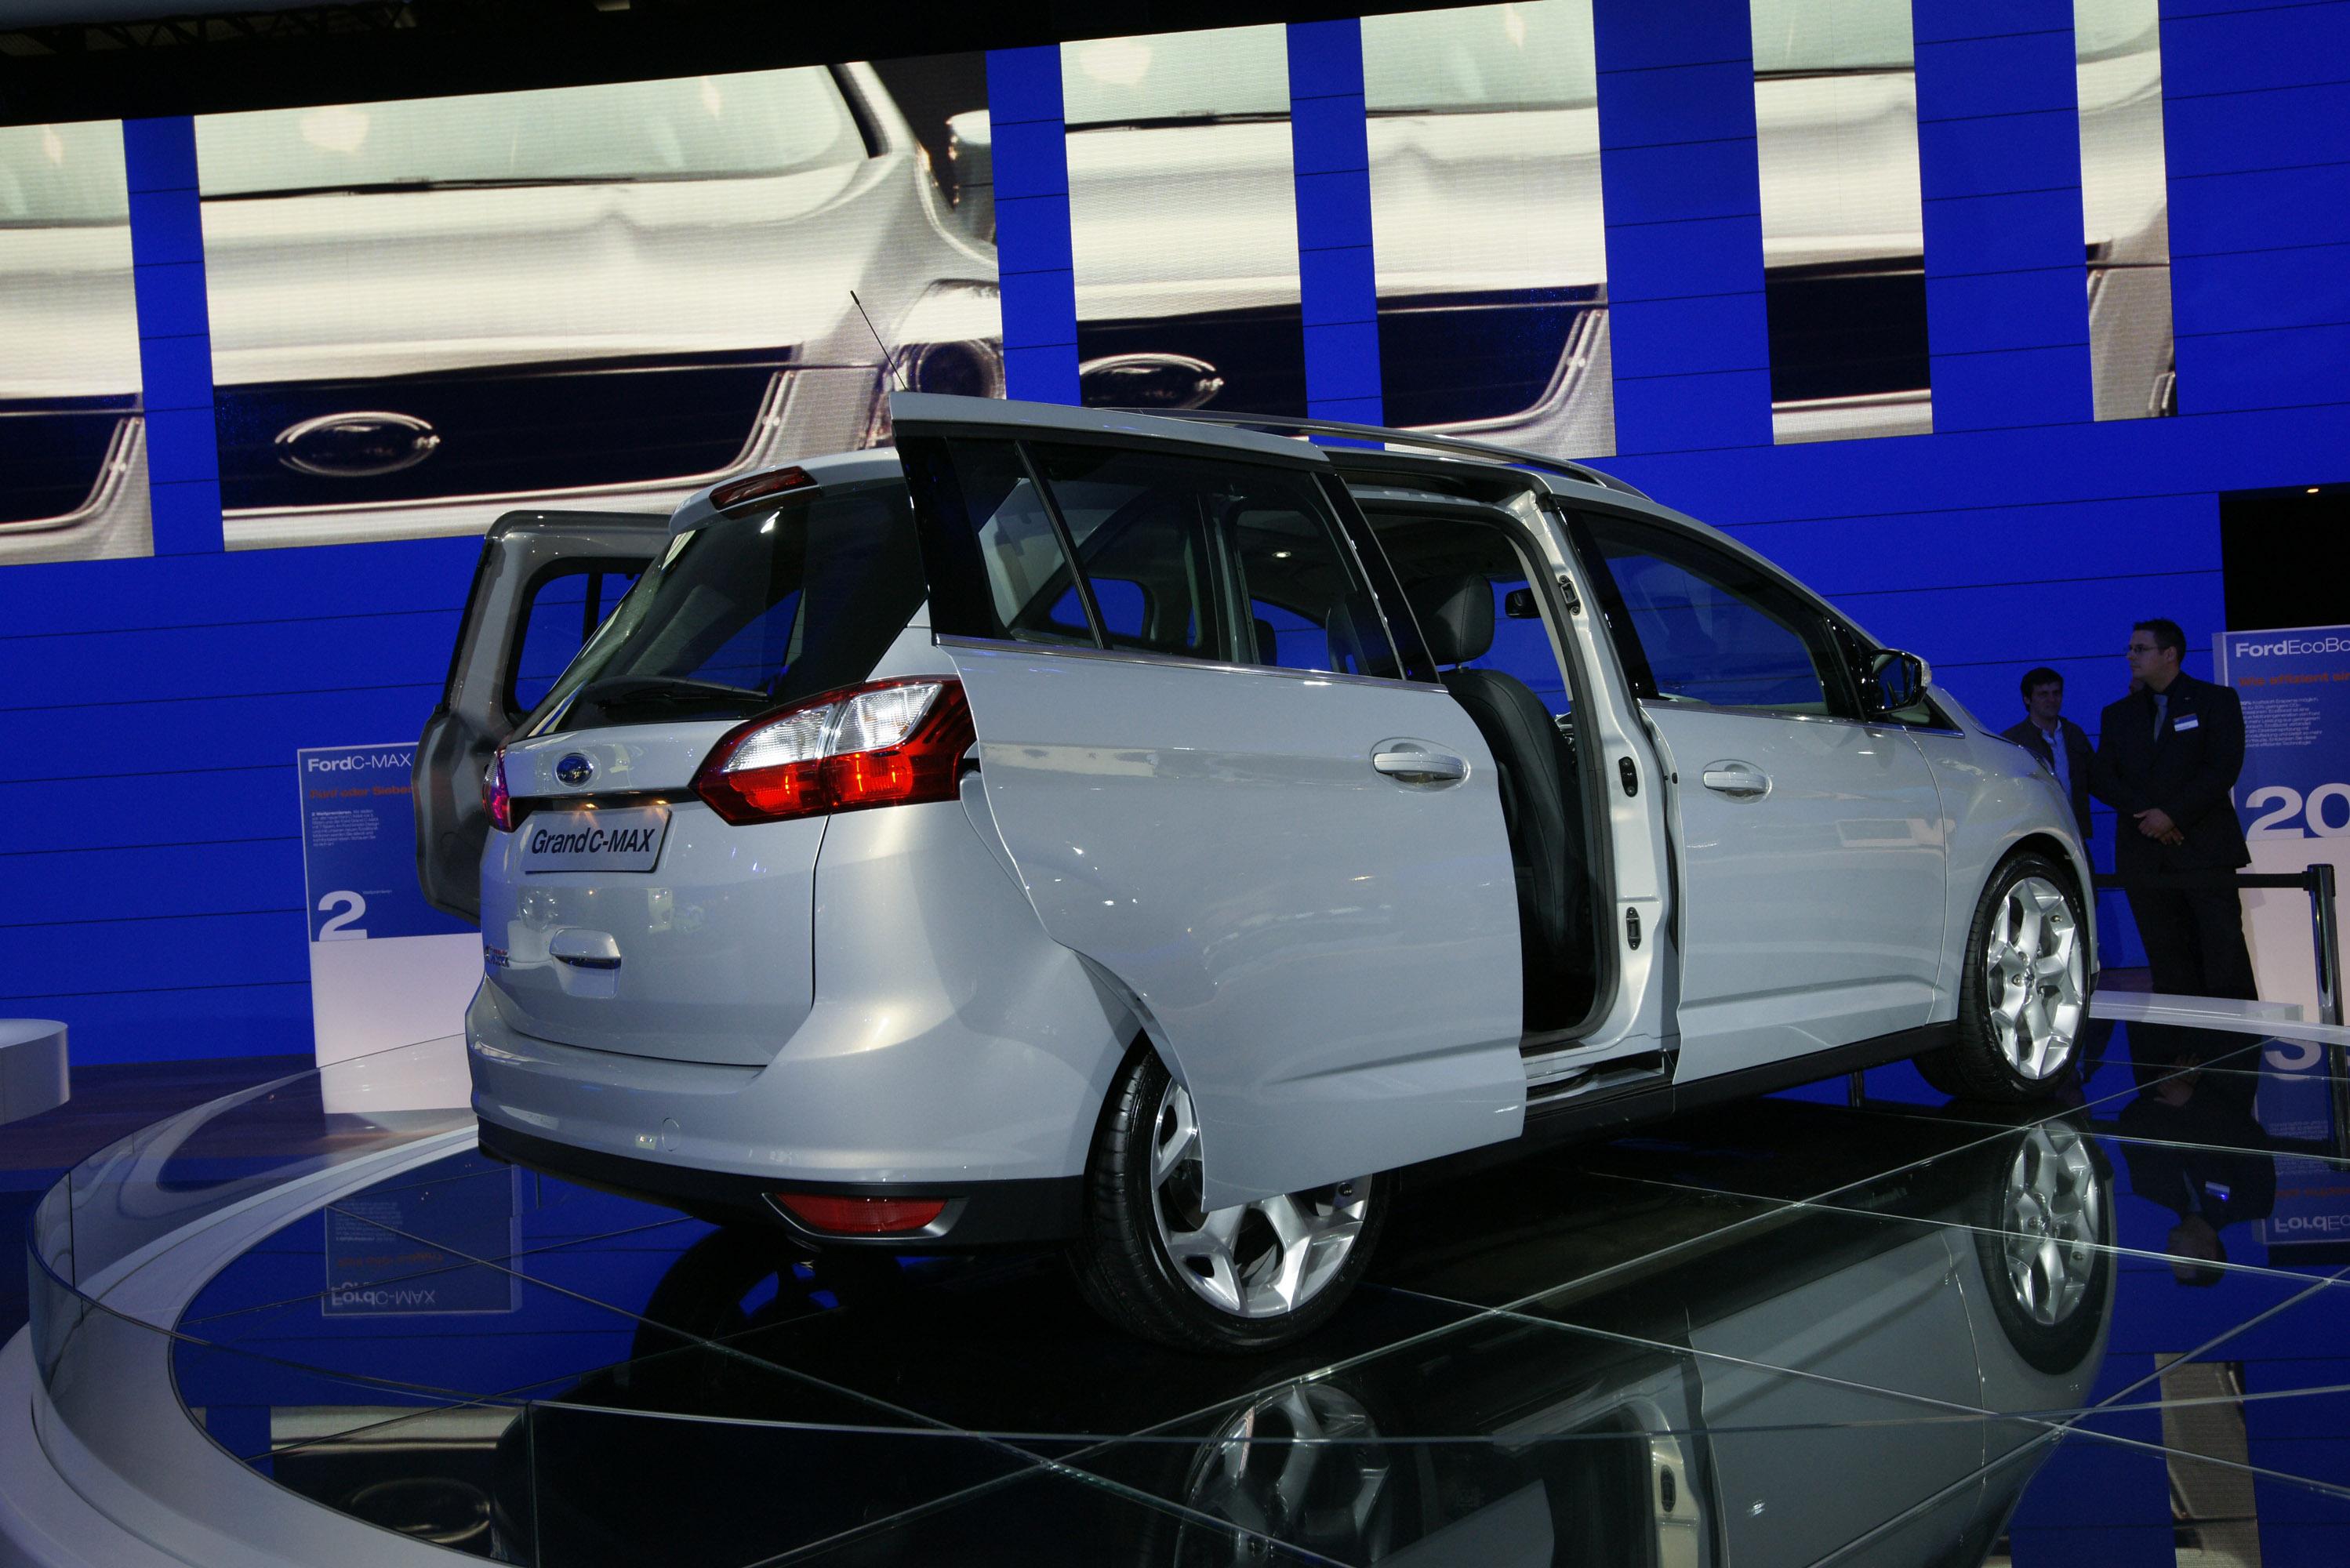 Ford Grand C Max Frankfurt 2009 Picture 26250